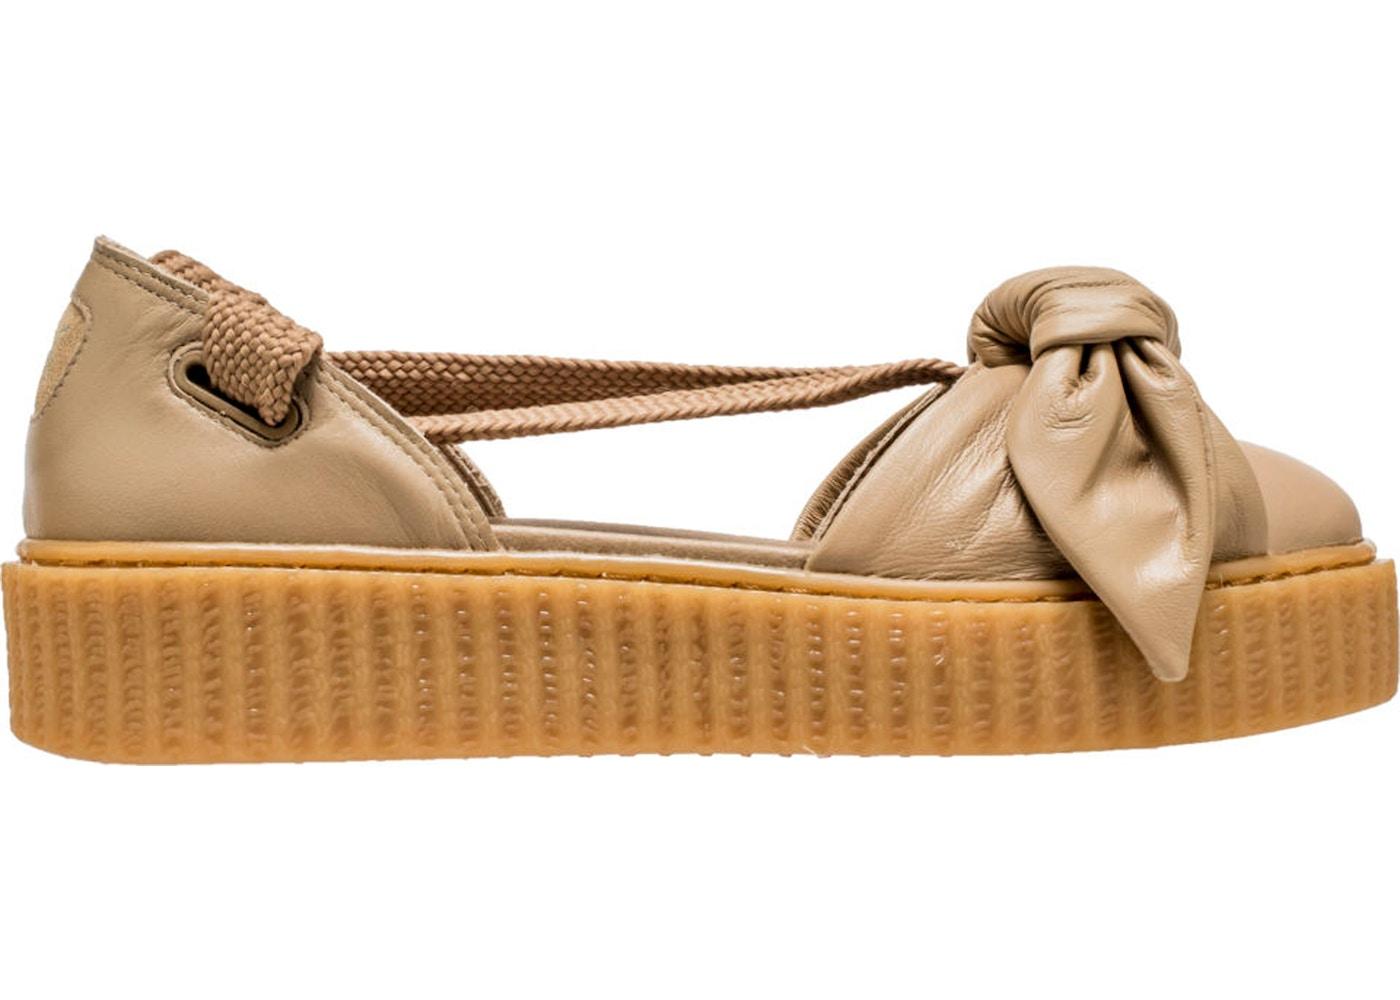 747ce80349b7 Puma Bow Creeper Sandal Rihanna Fenty Natural (W) - 365794-03